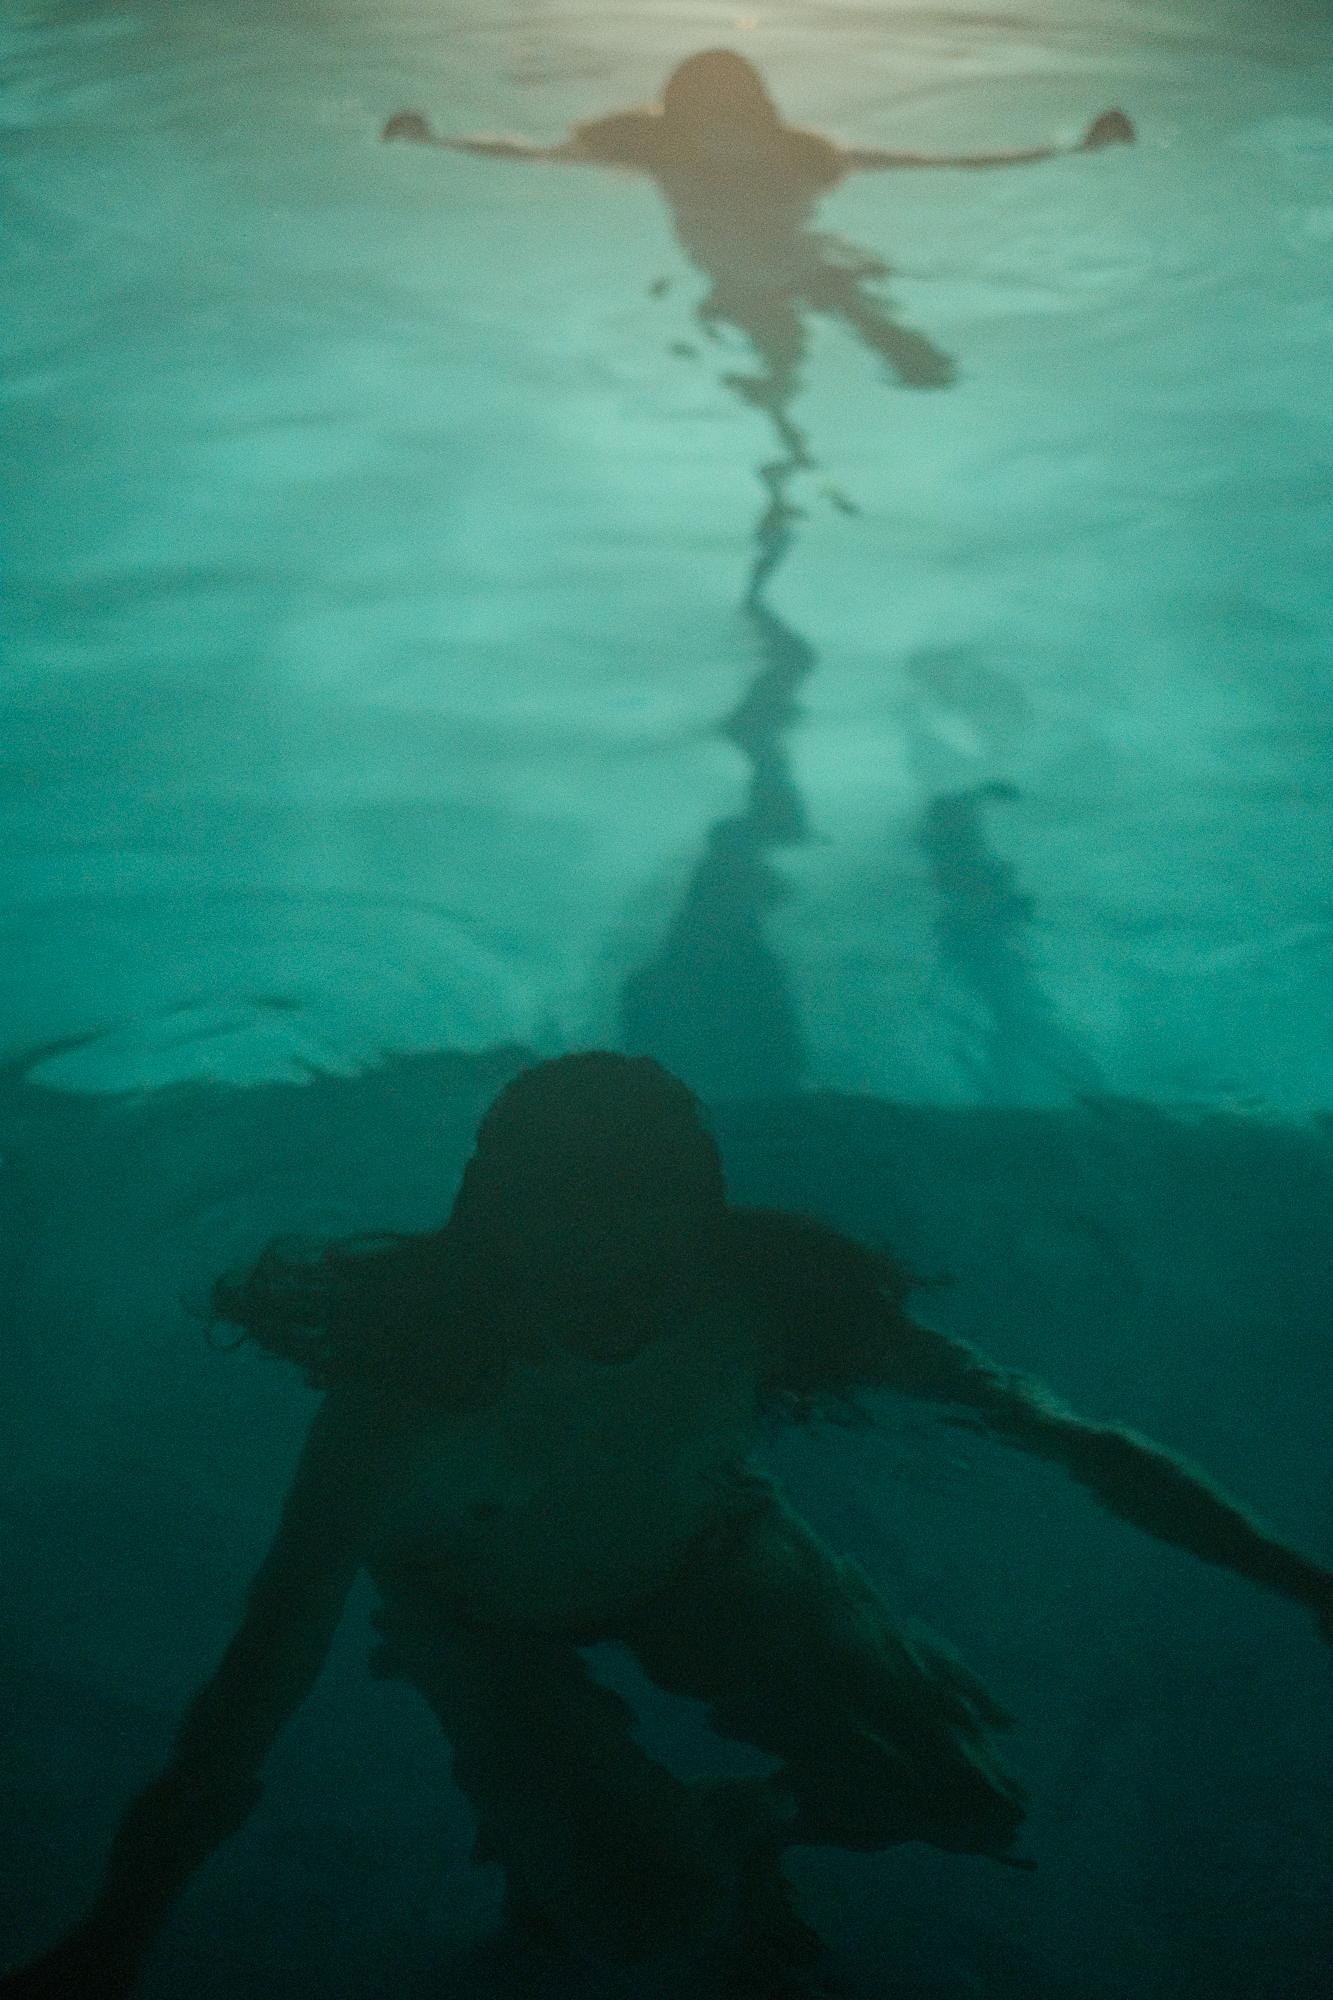 20170619-Ariane-Cassidy-Hannah-swimming-pool-X-Pro2-0335-Edit.jpg